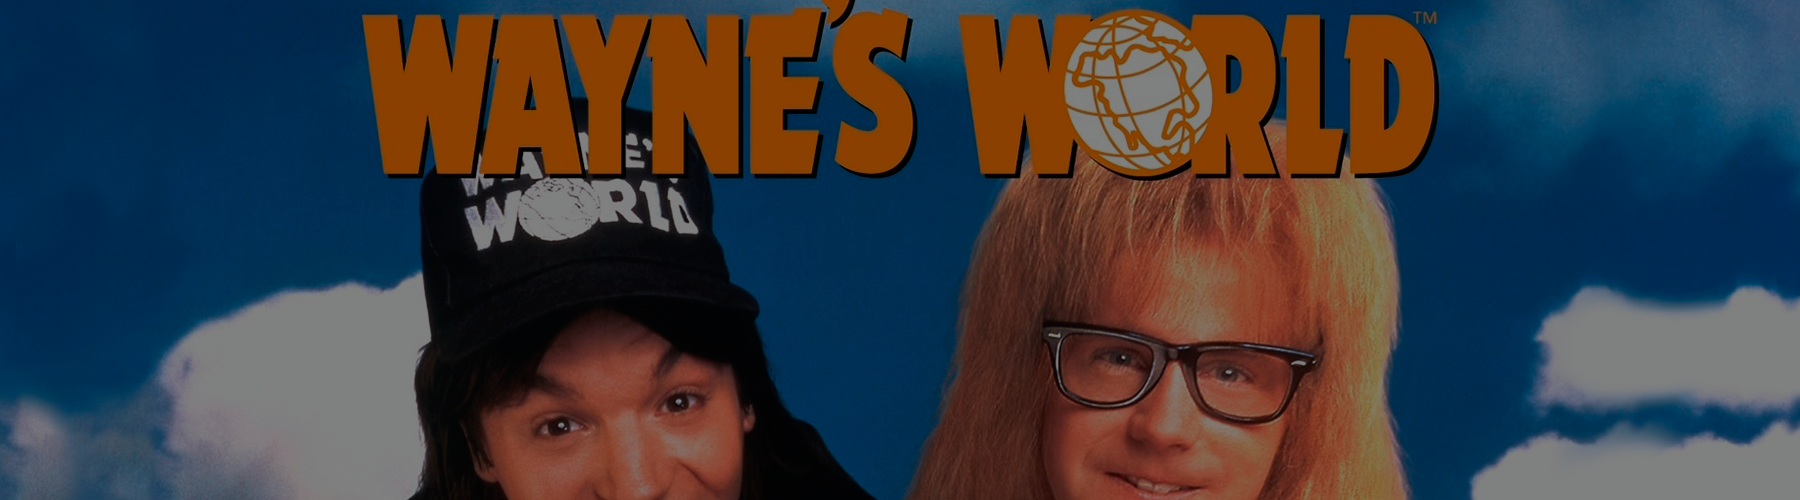 waynes-world-Overview